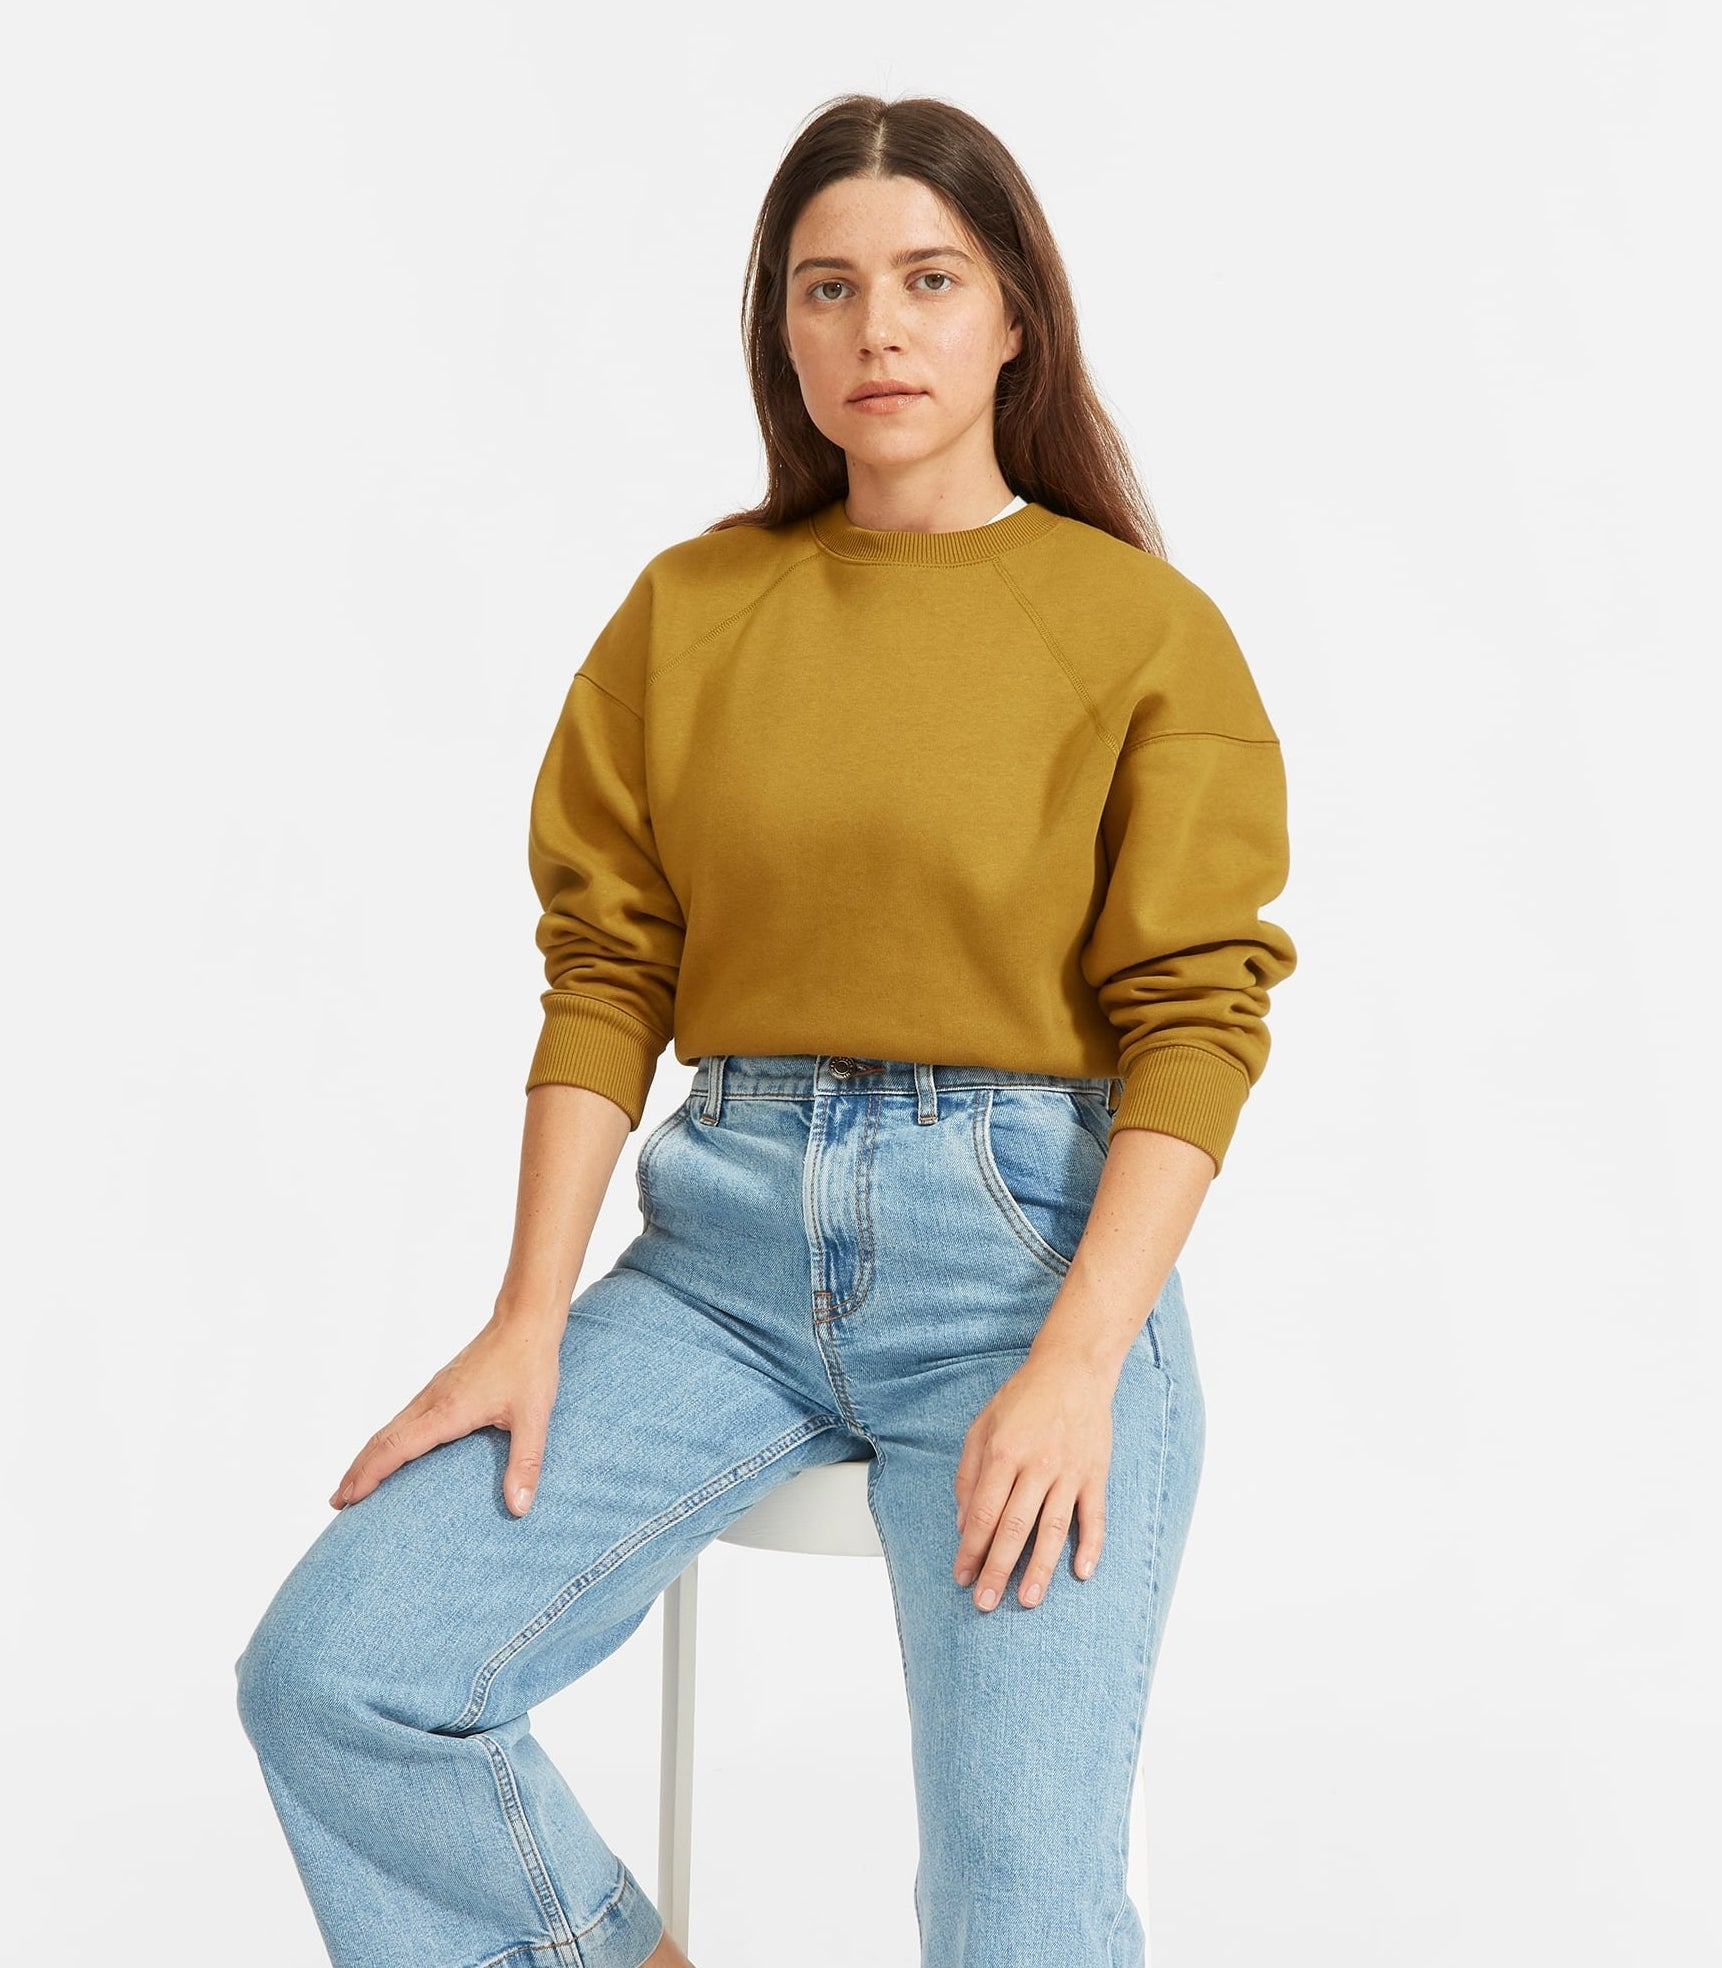 model in yellowish green sweatshirt